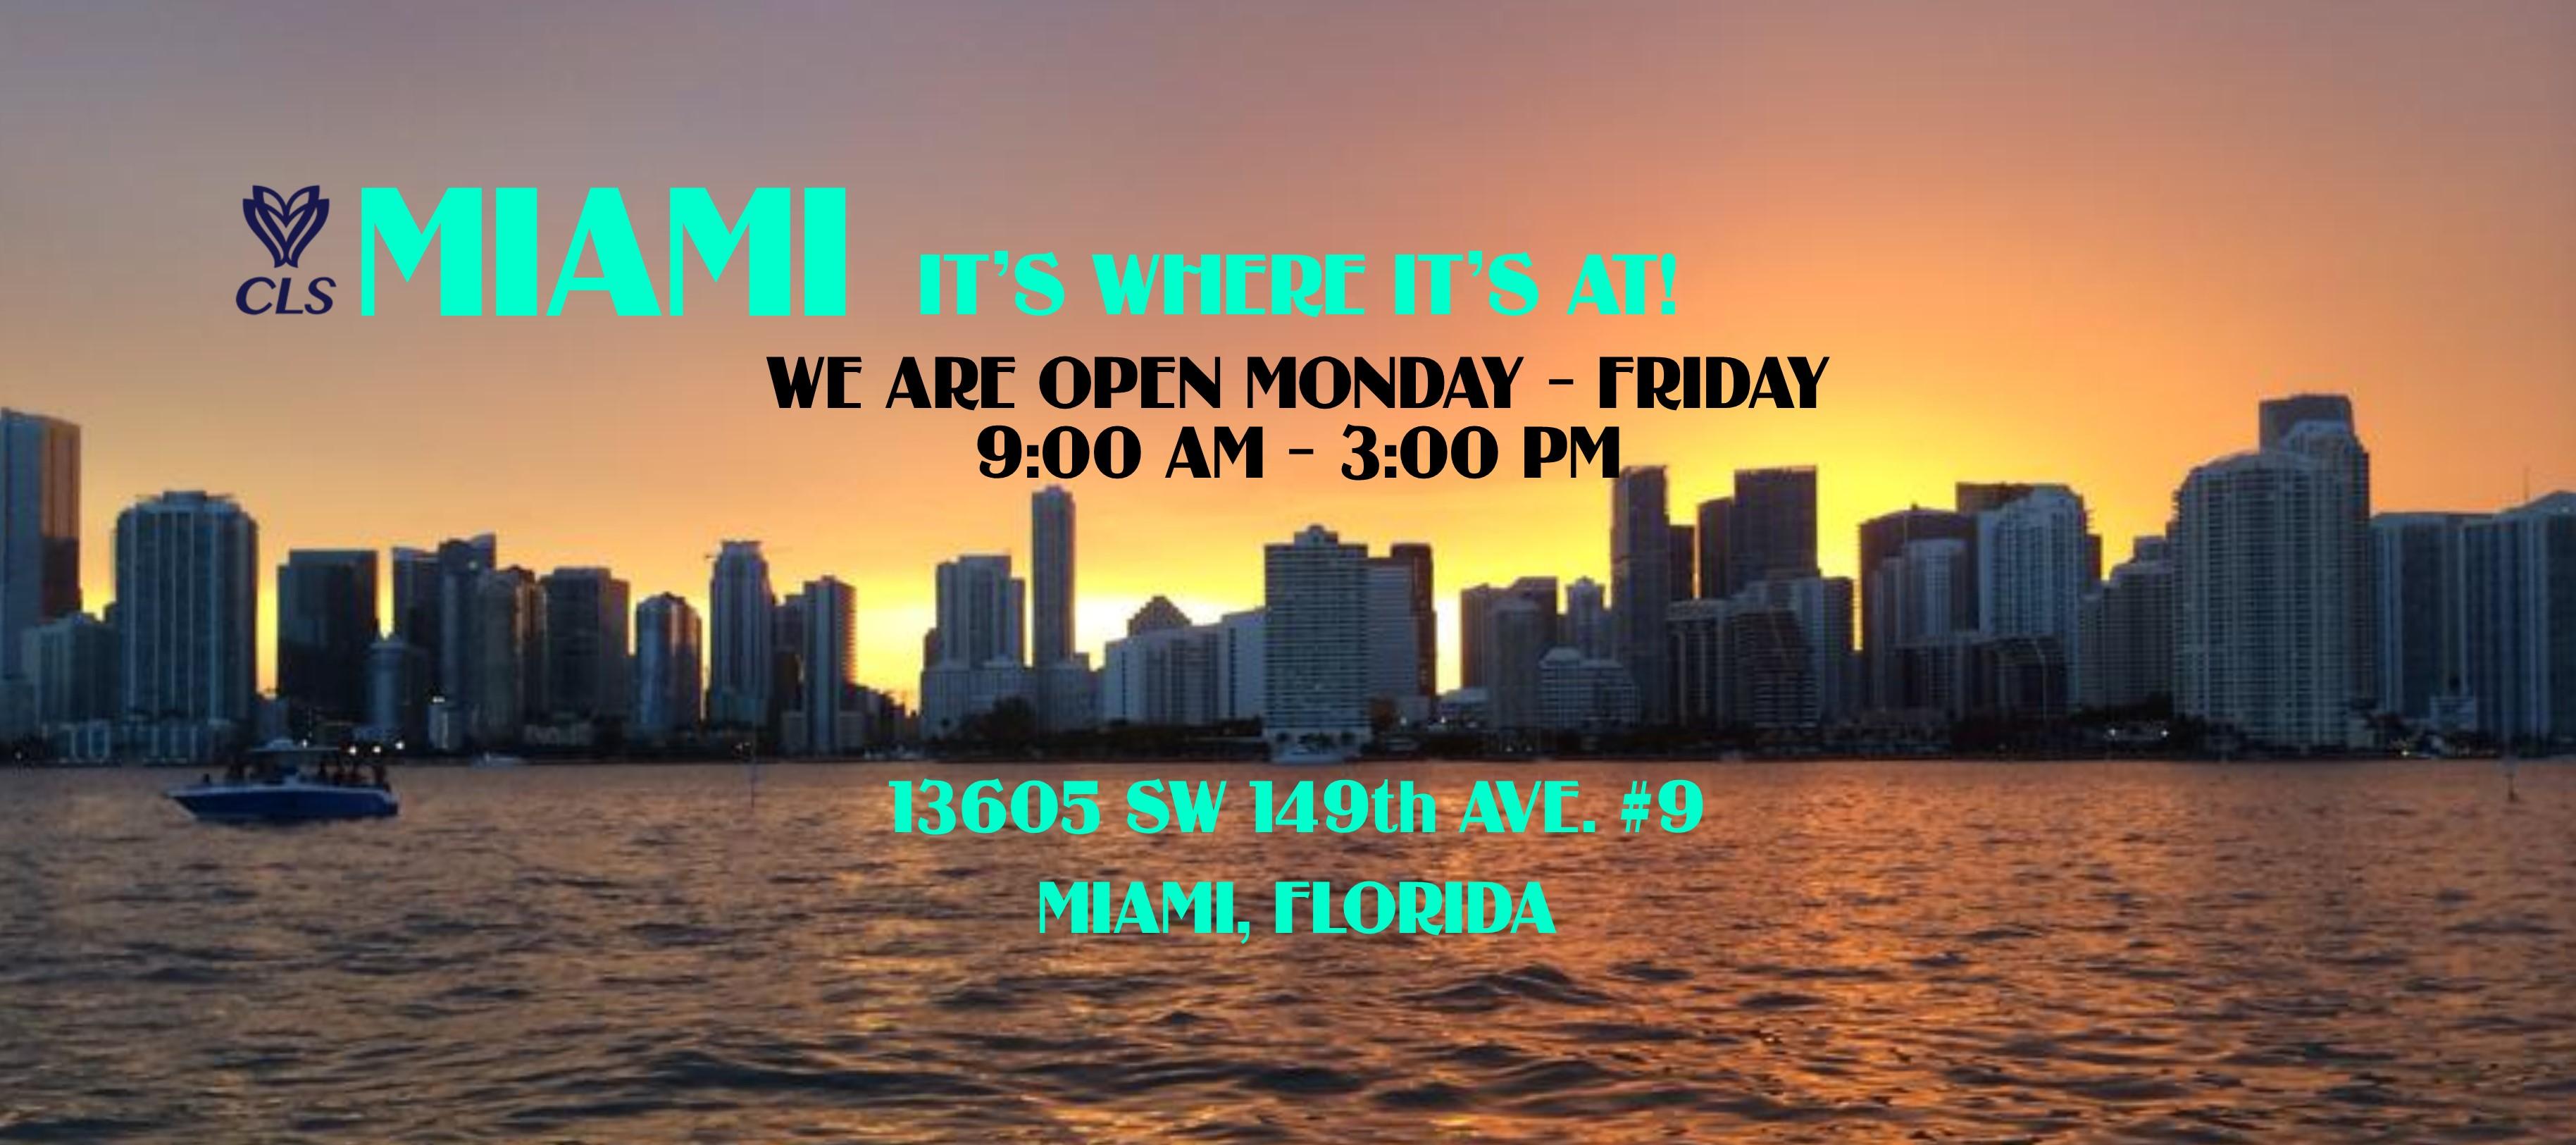 https://www.clssportswear.com/wp-content/uploads/2019/03/Miami_Skyline_CLS_Hours.jpg